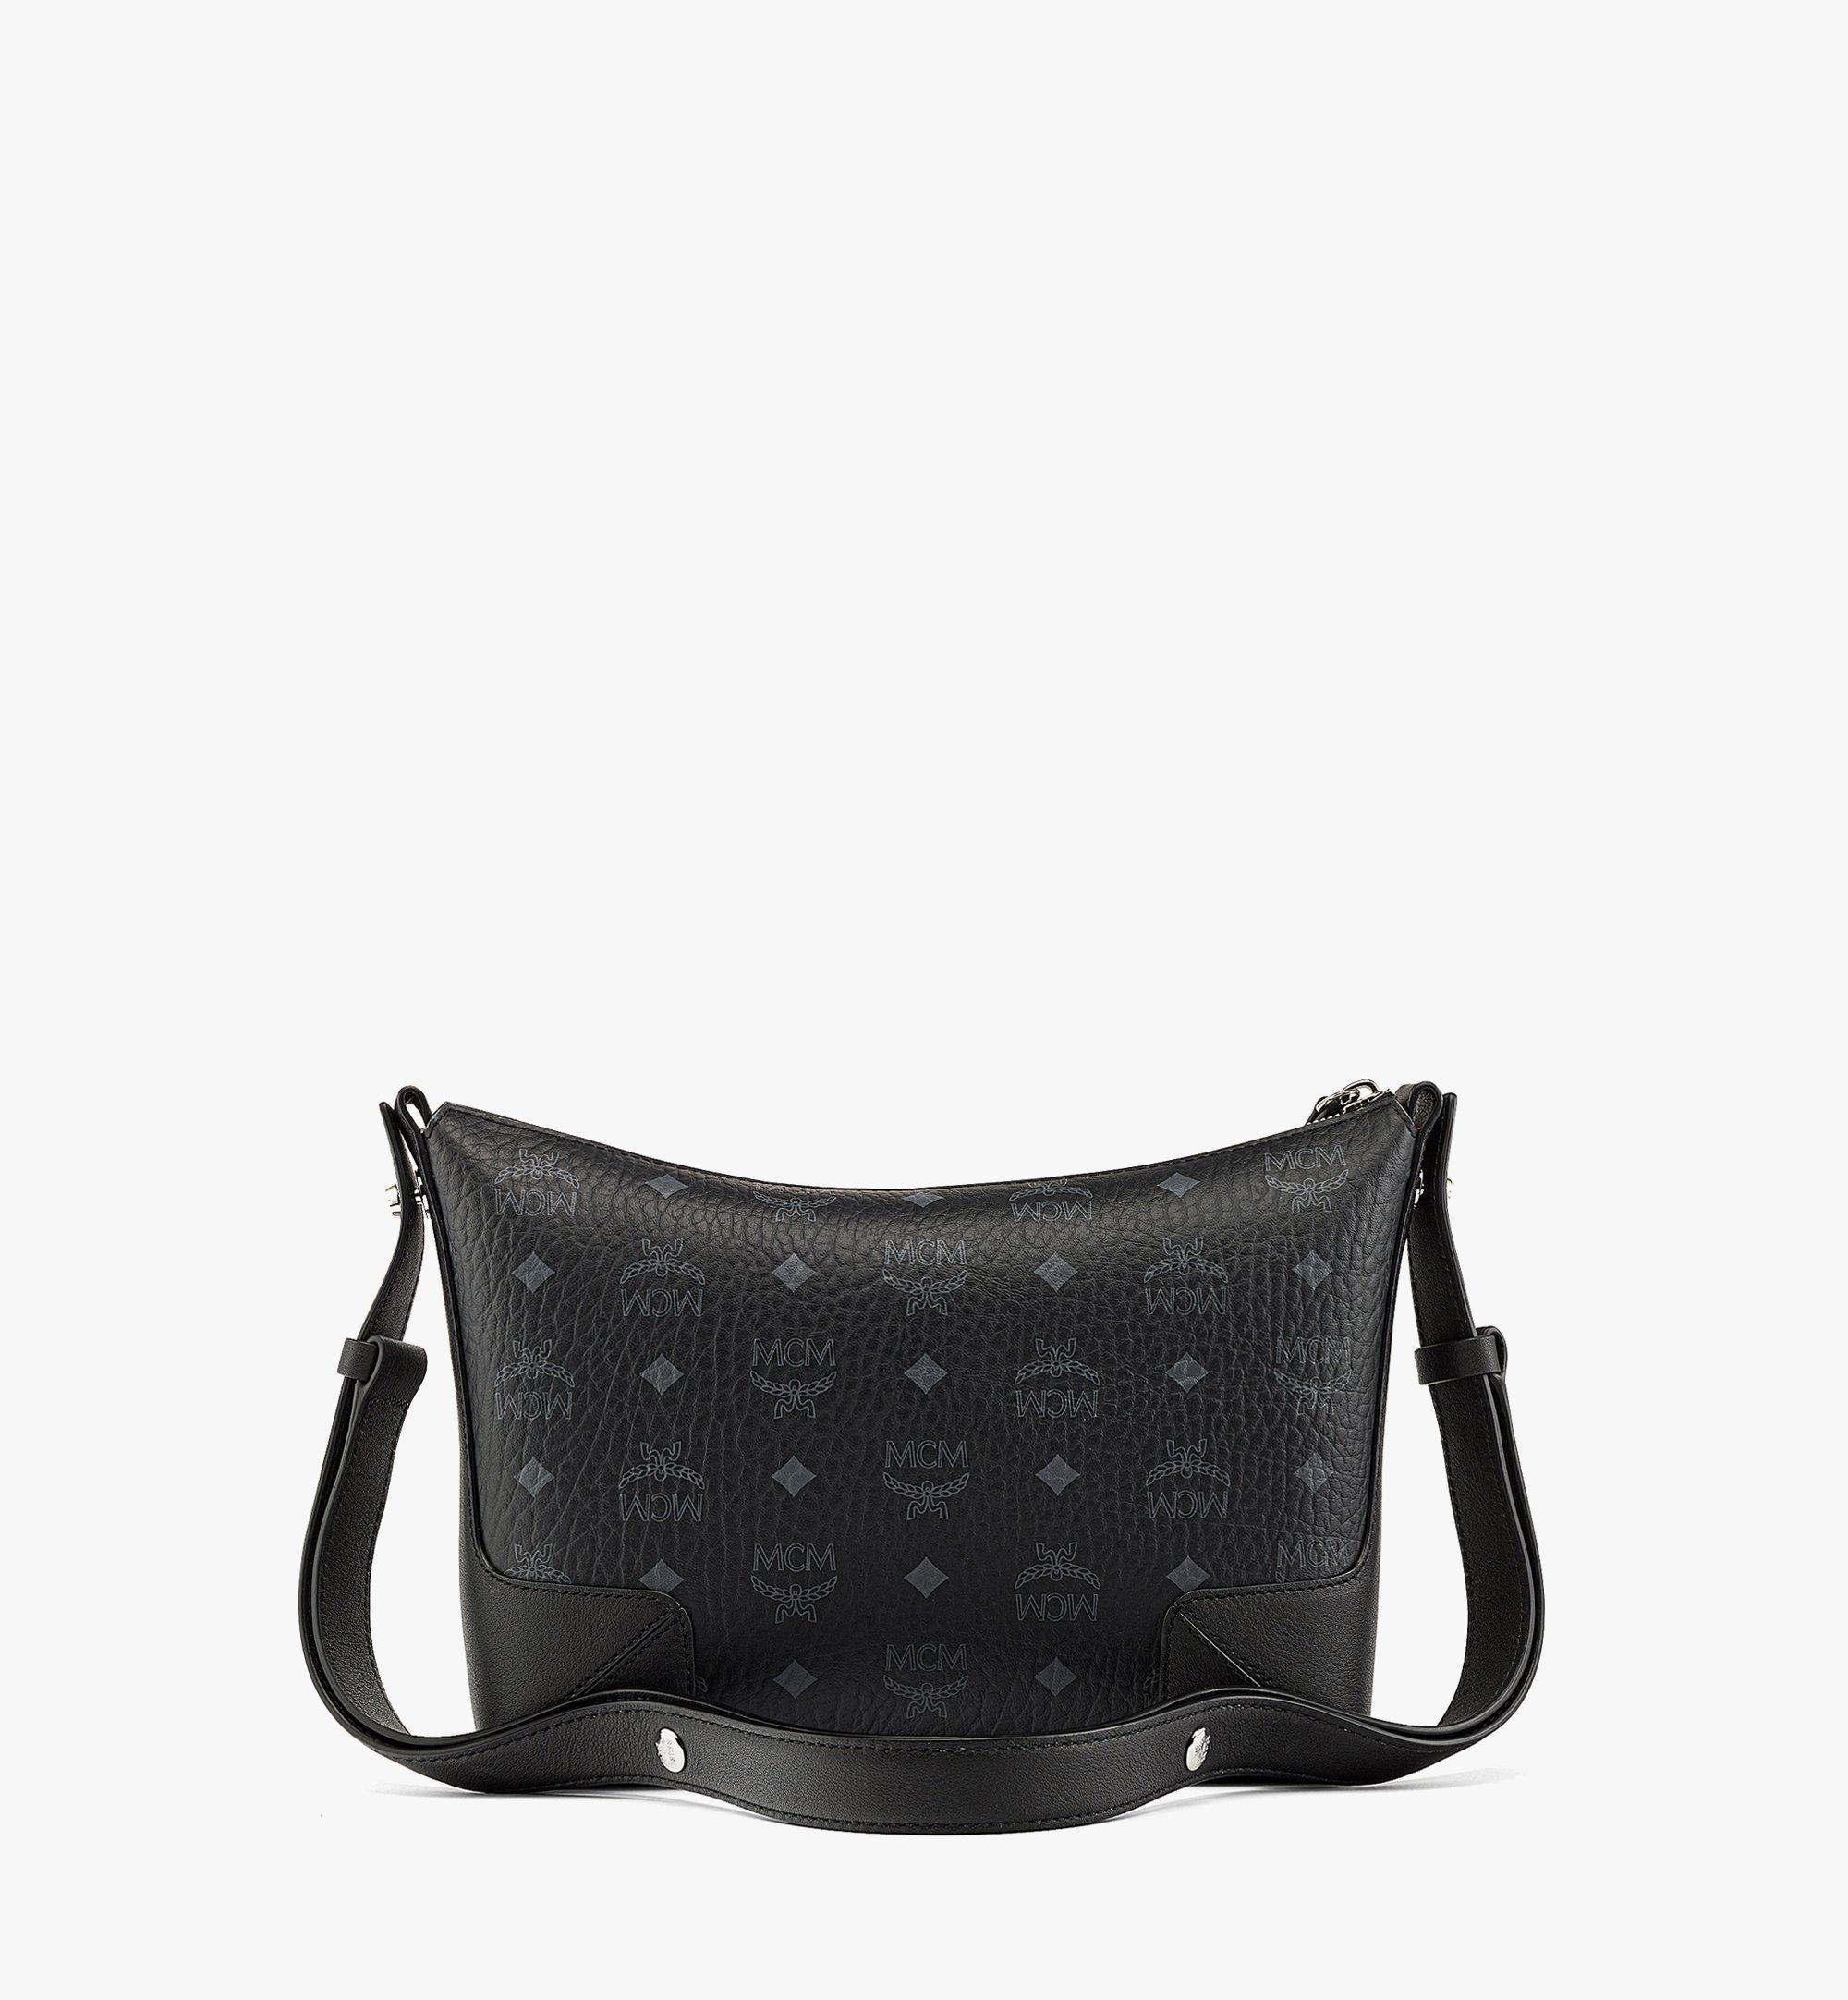 MCM Klara Shoulder Bag in Visetos Black MWSBSKM01BK001 Alternate View 3